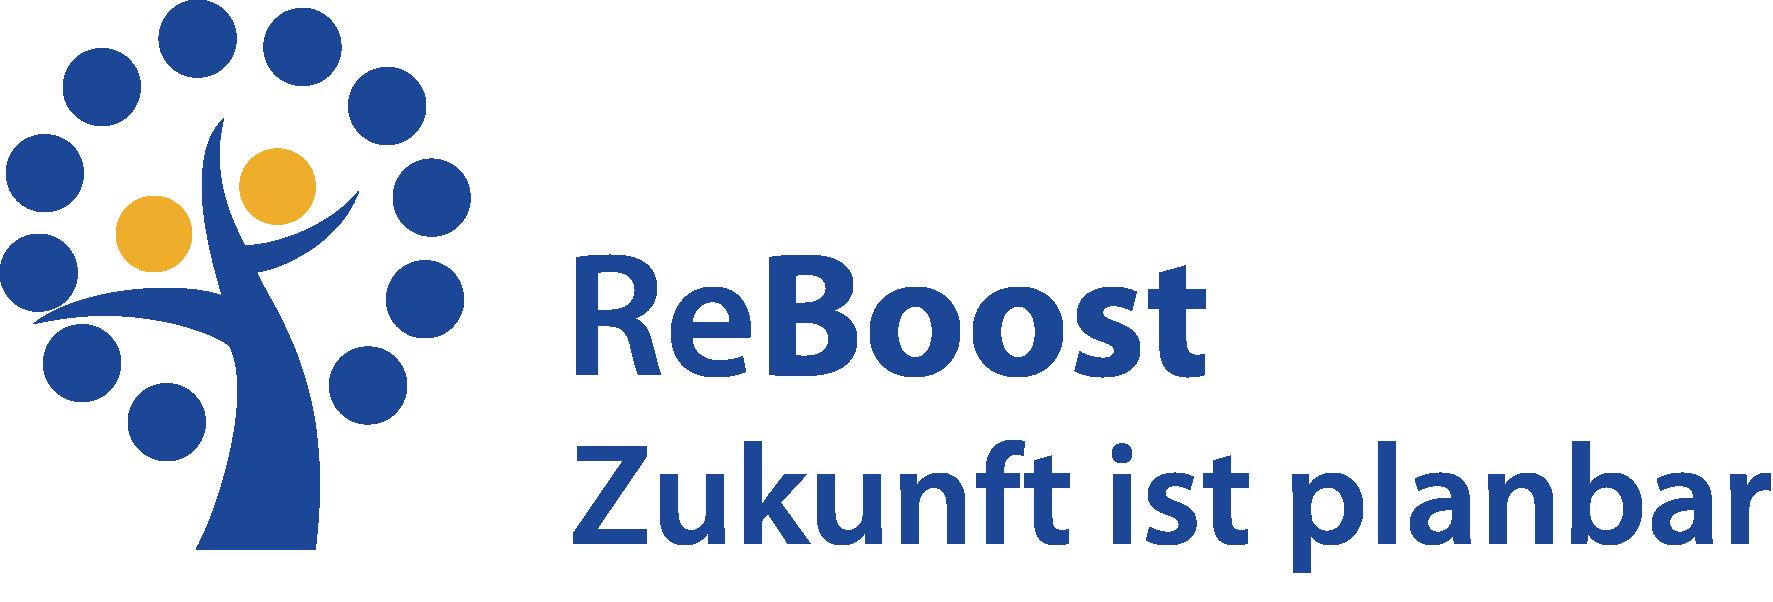 https://dlz-handwerk.de/wp-content/uploads/2021/09/EPSLogo_ReBoost.png